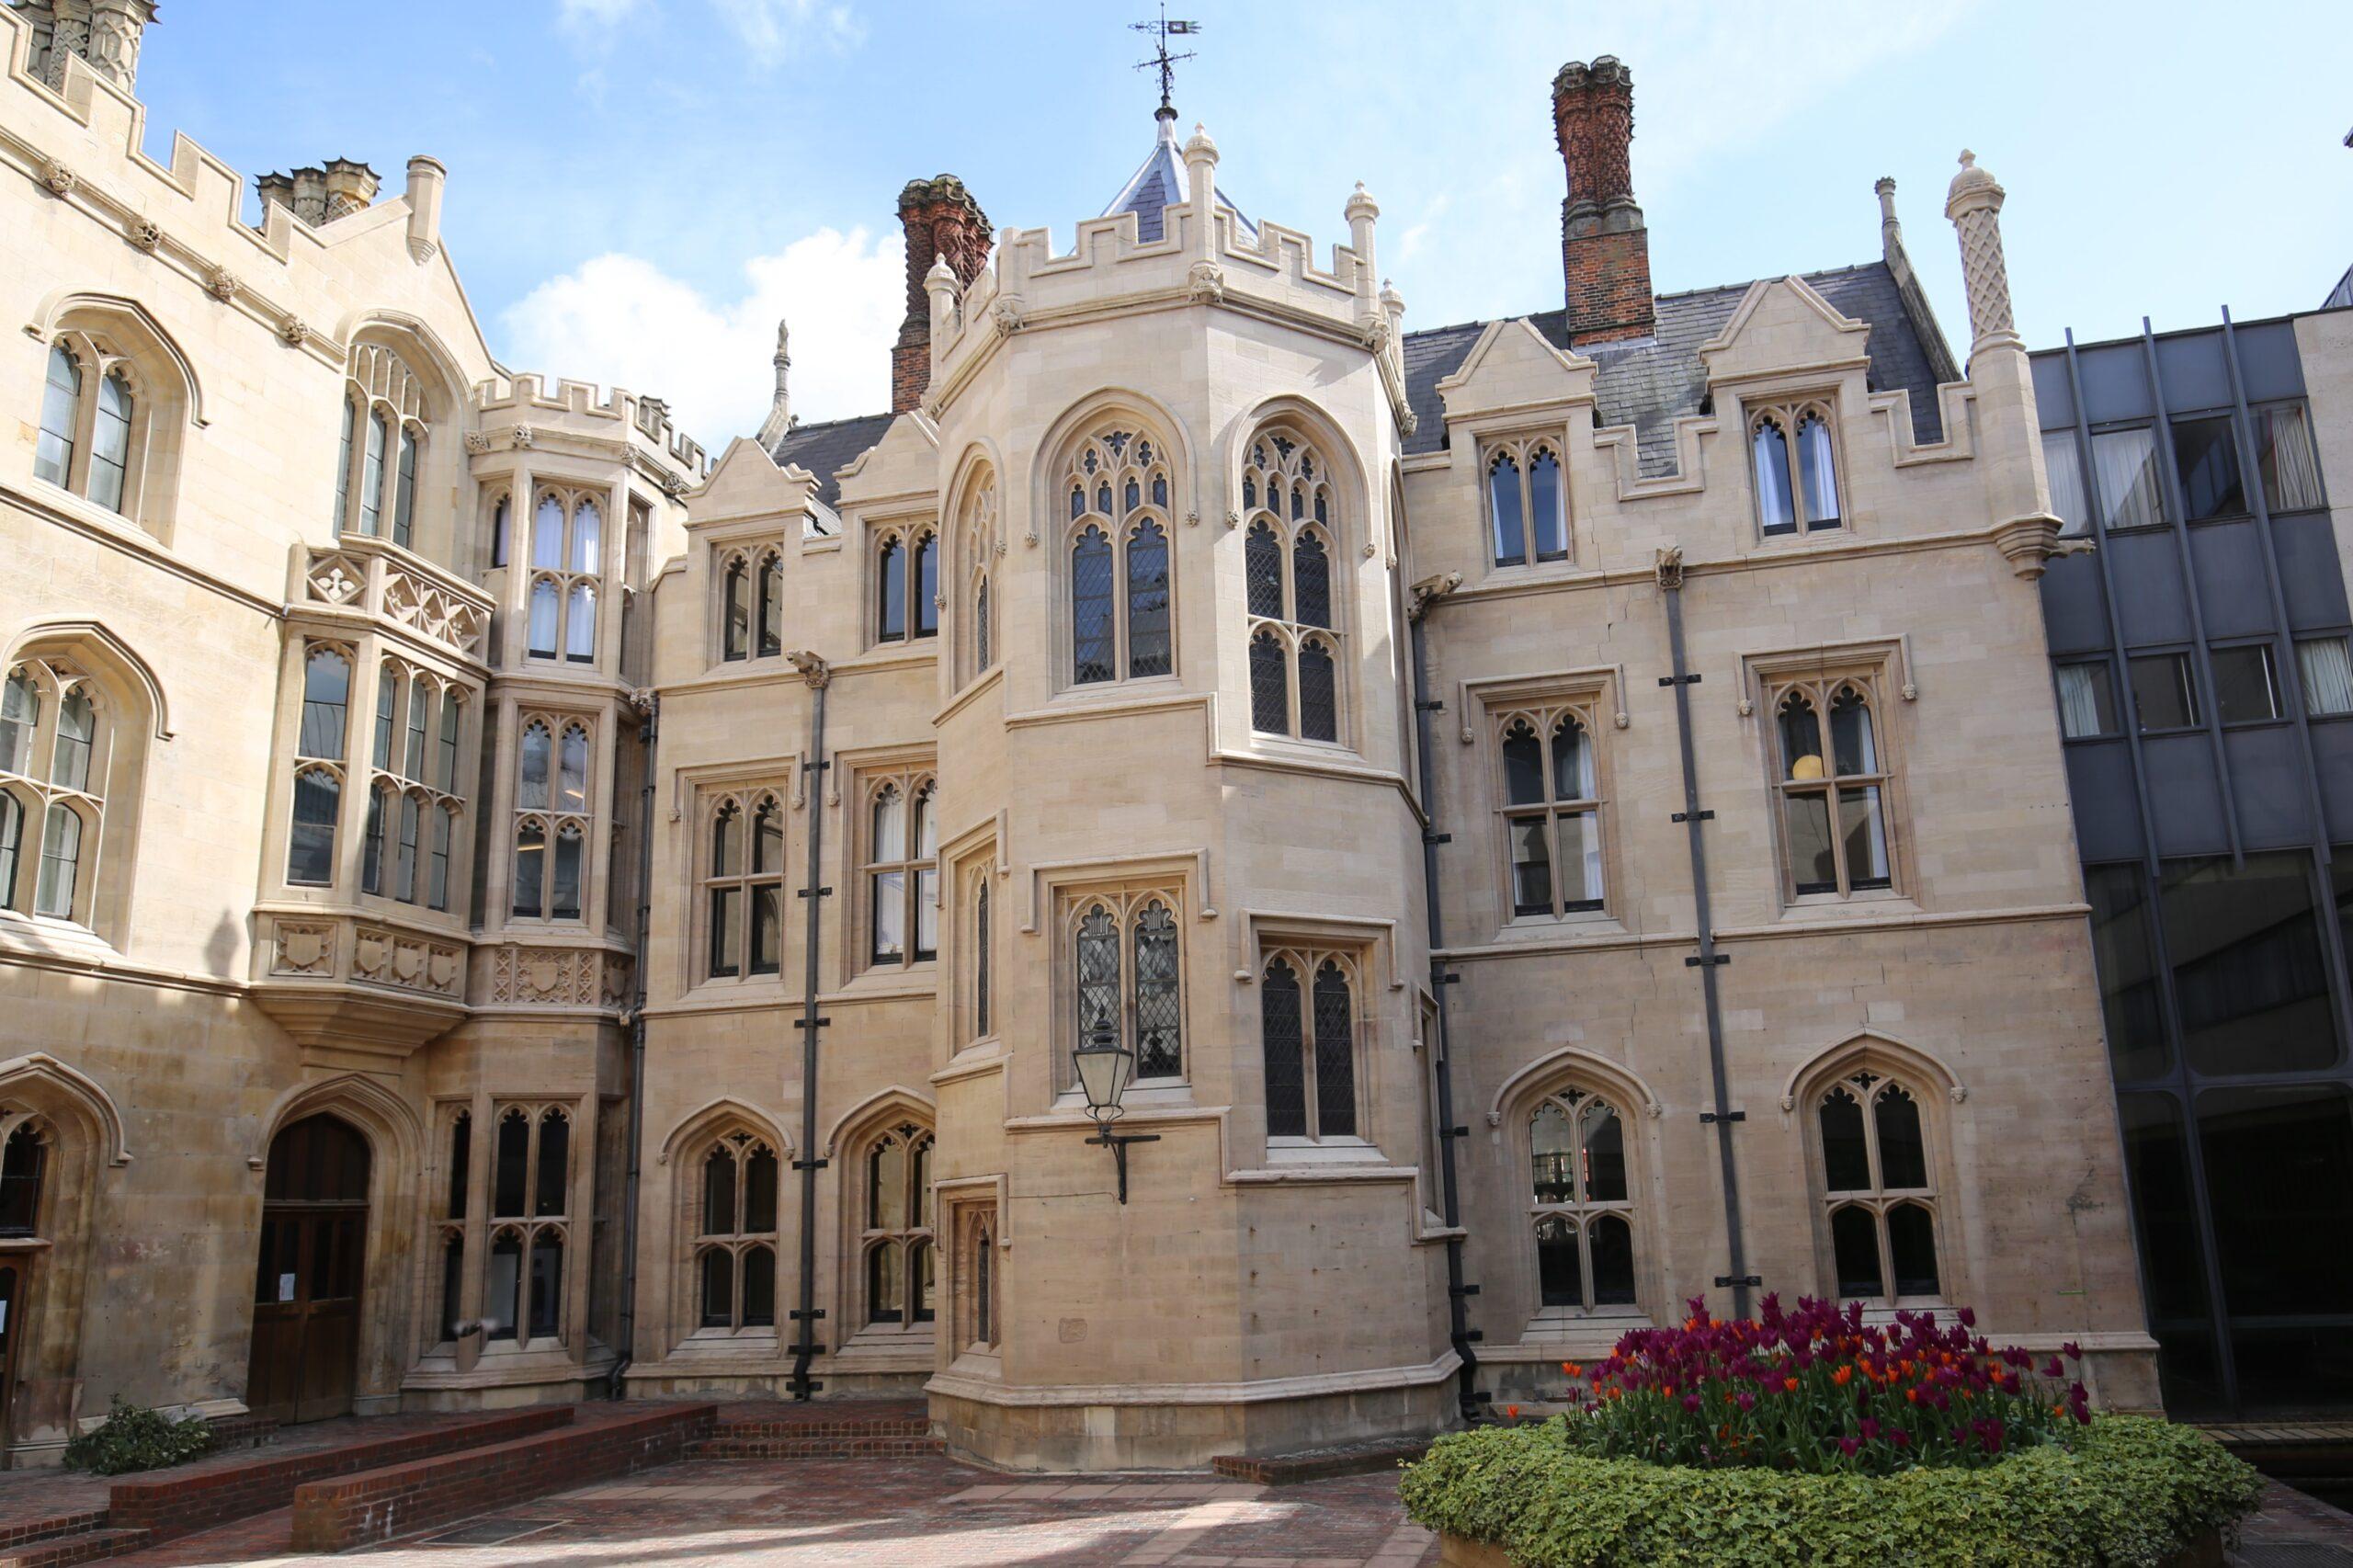 King's College restoration